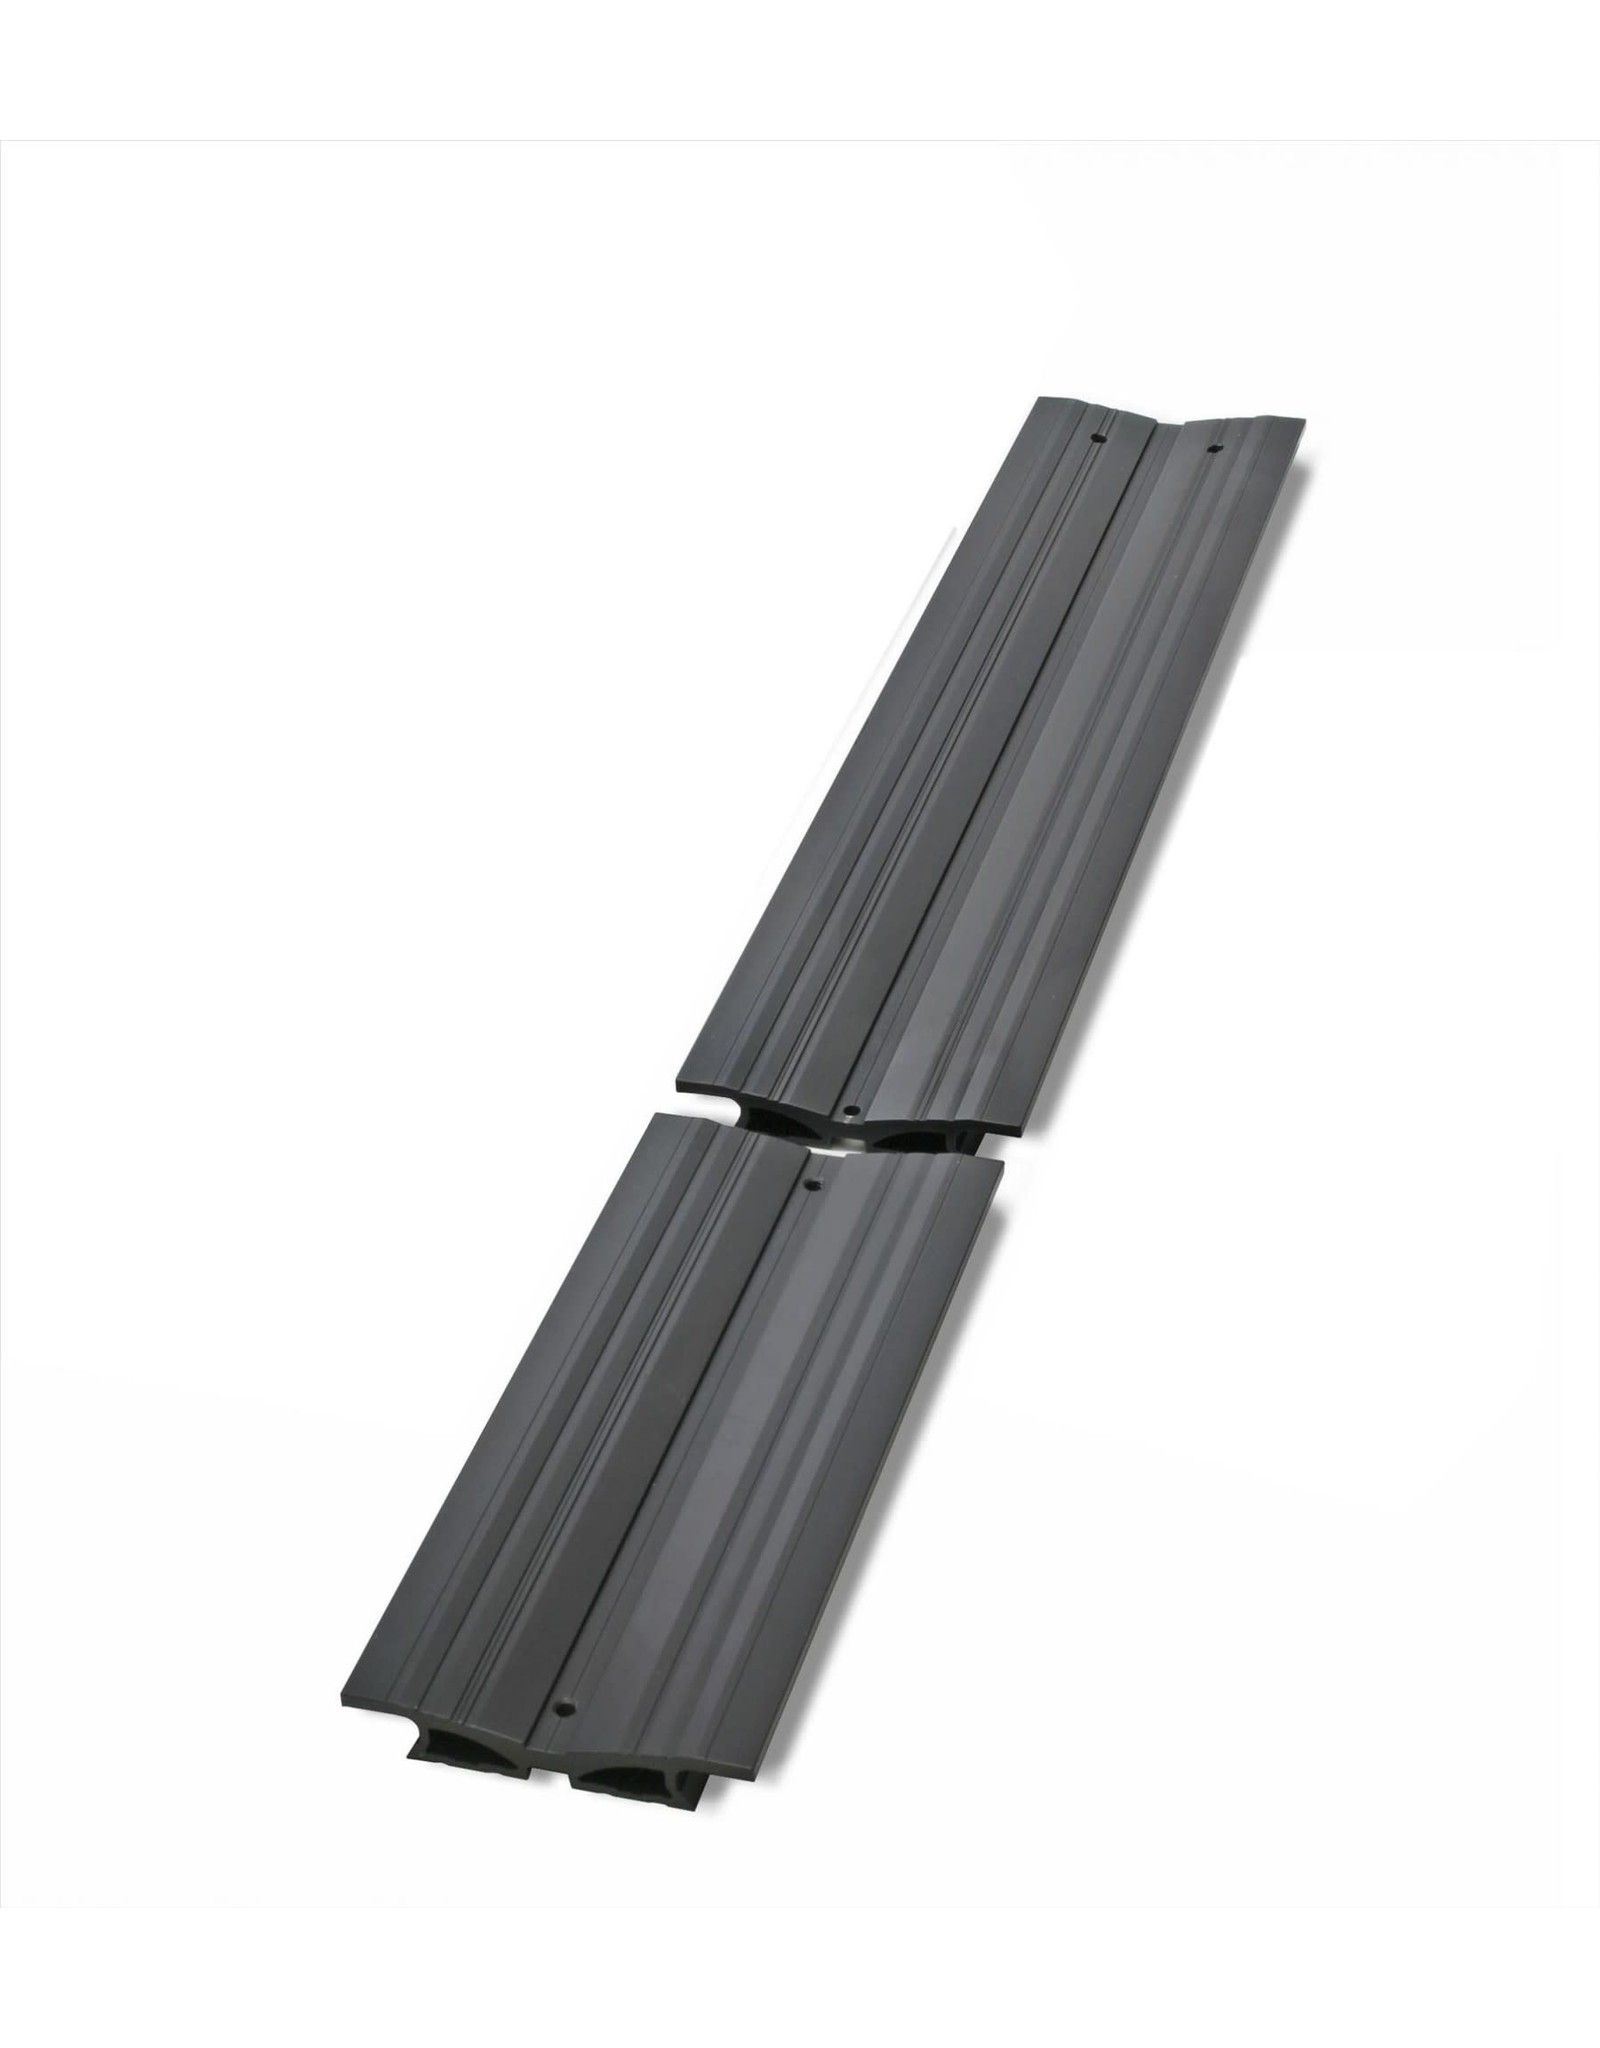 "Baader Planetarium Baader 3"" Dove Tail Bar 470mm (18,5"") Black anodized"